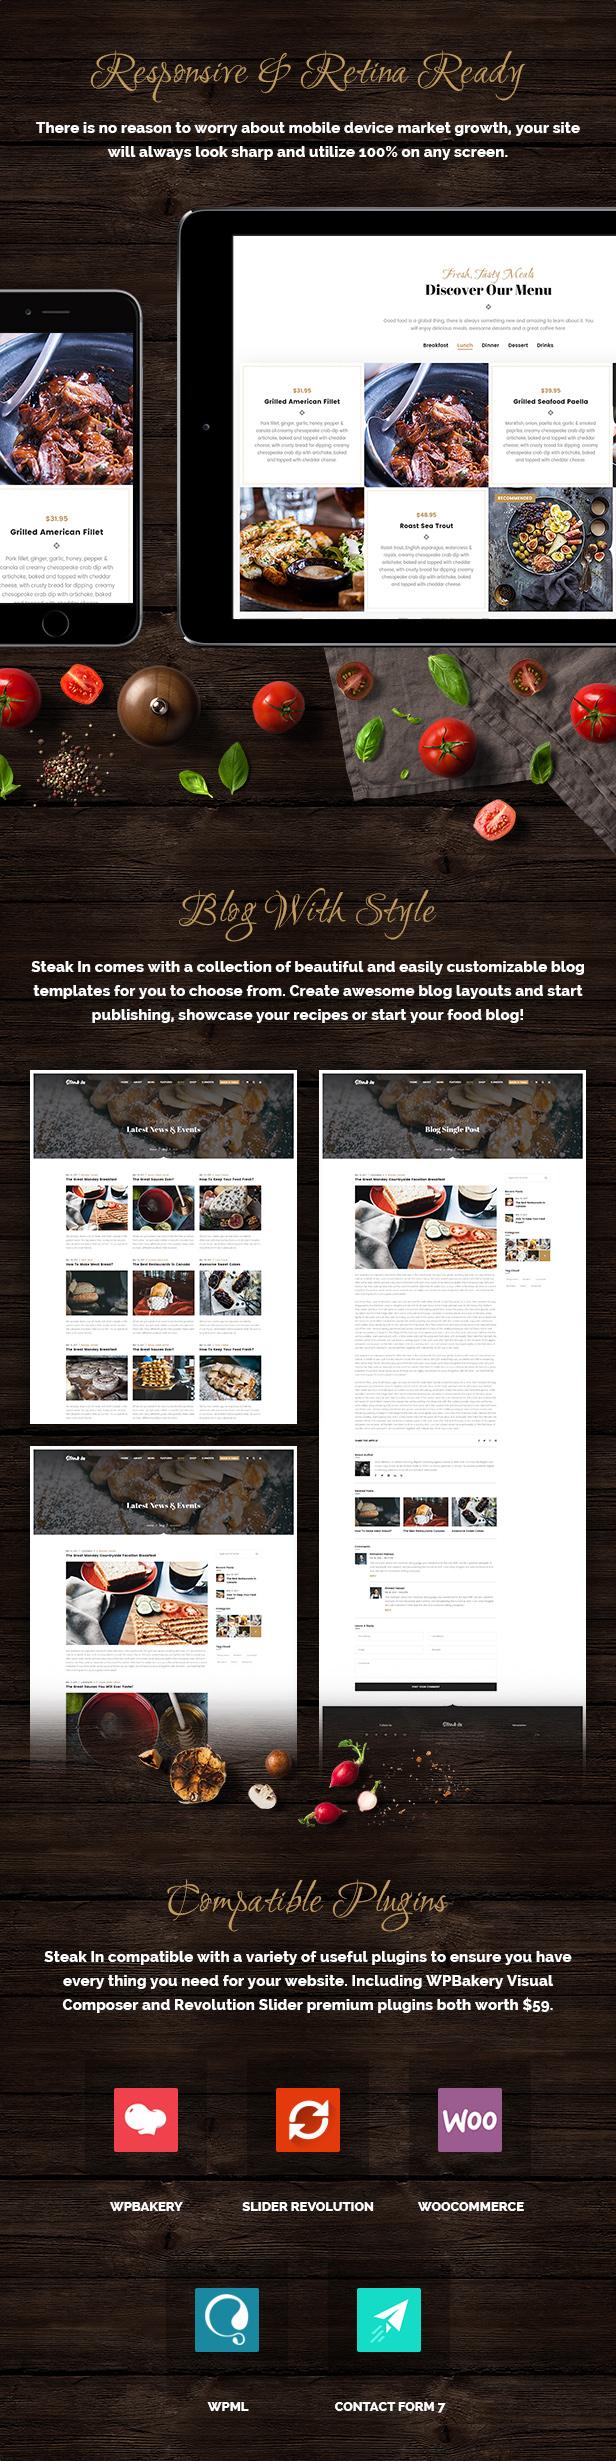 Steak In - Restaurant & Cafe WordPress Theme - 6